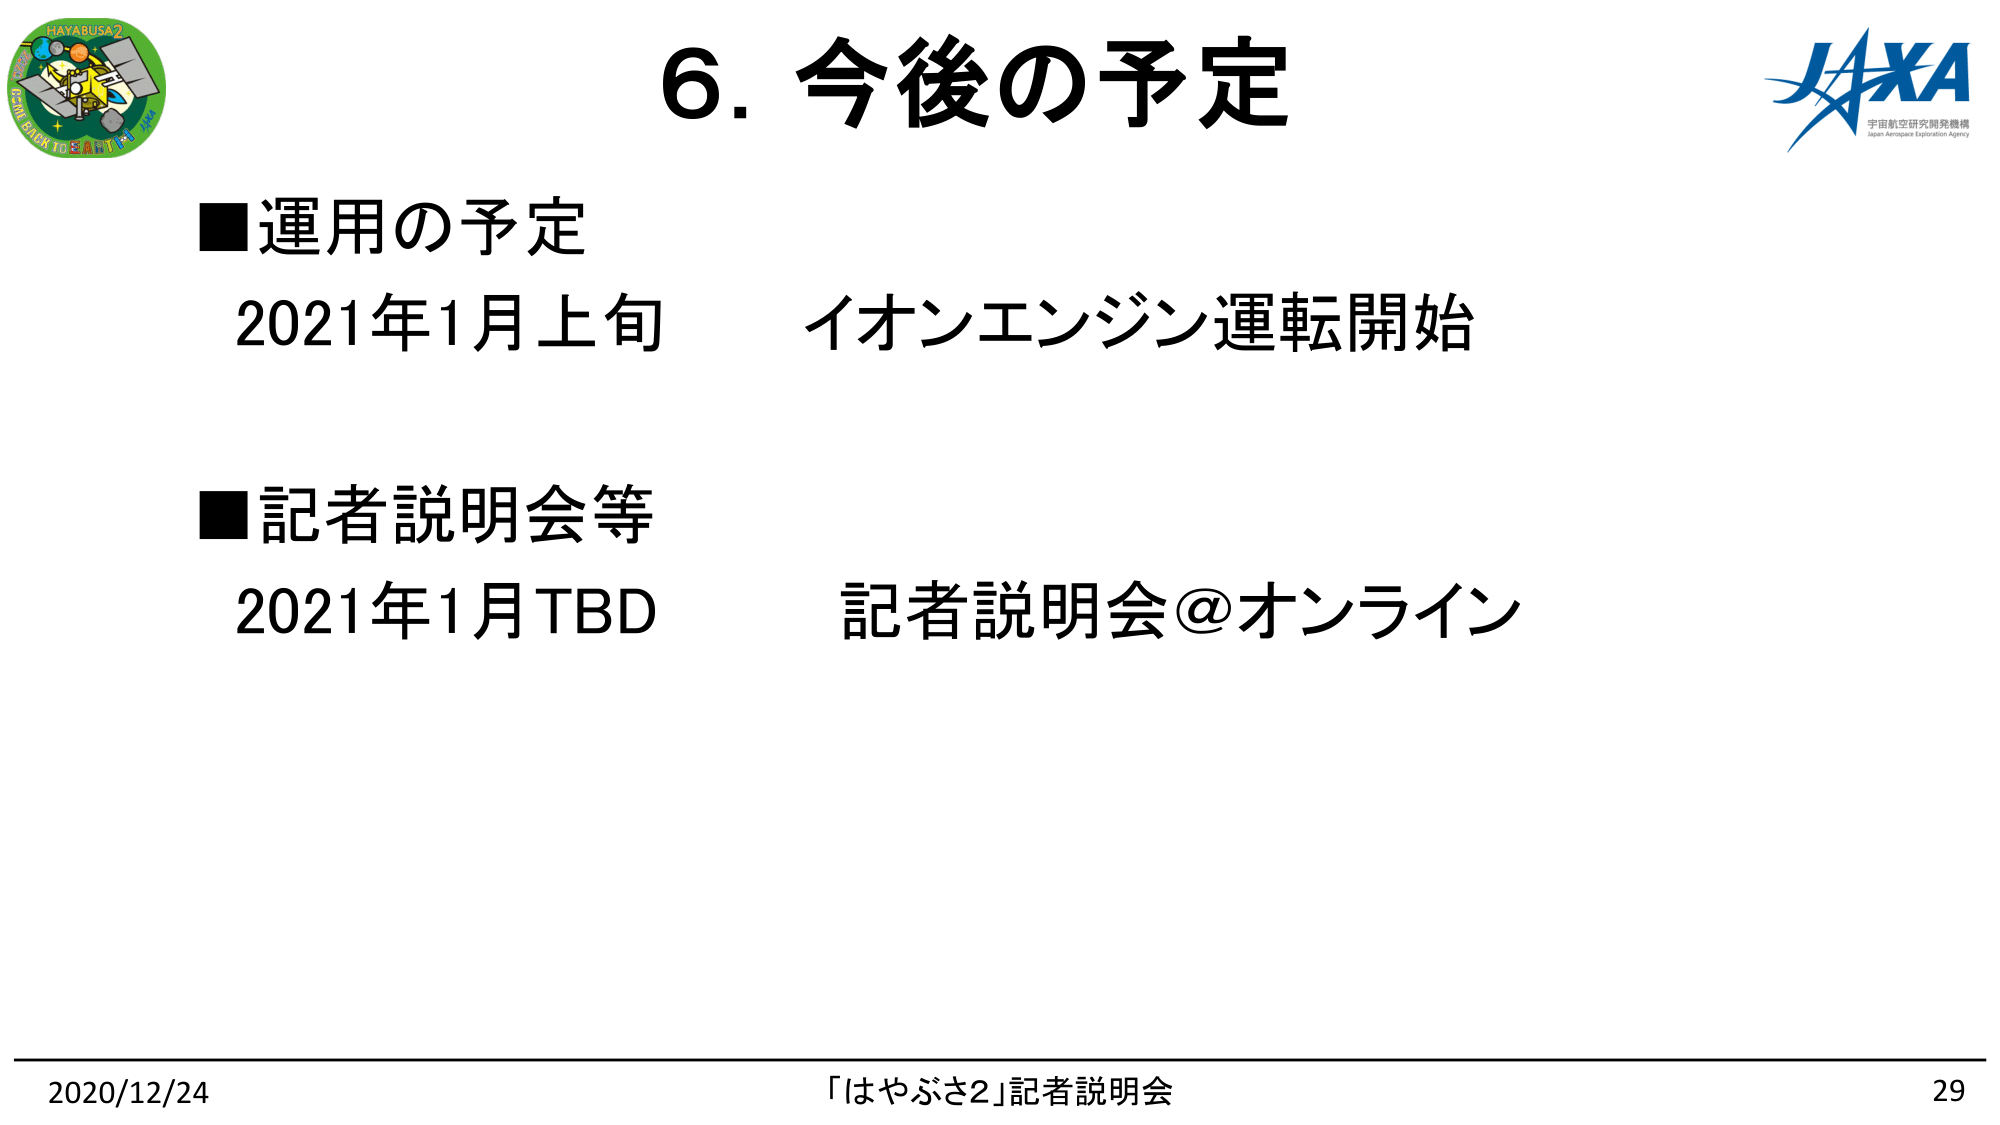 f:id:Imamura:20201224135320p:plain